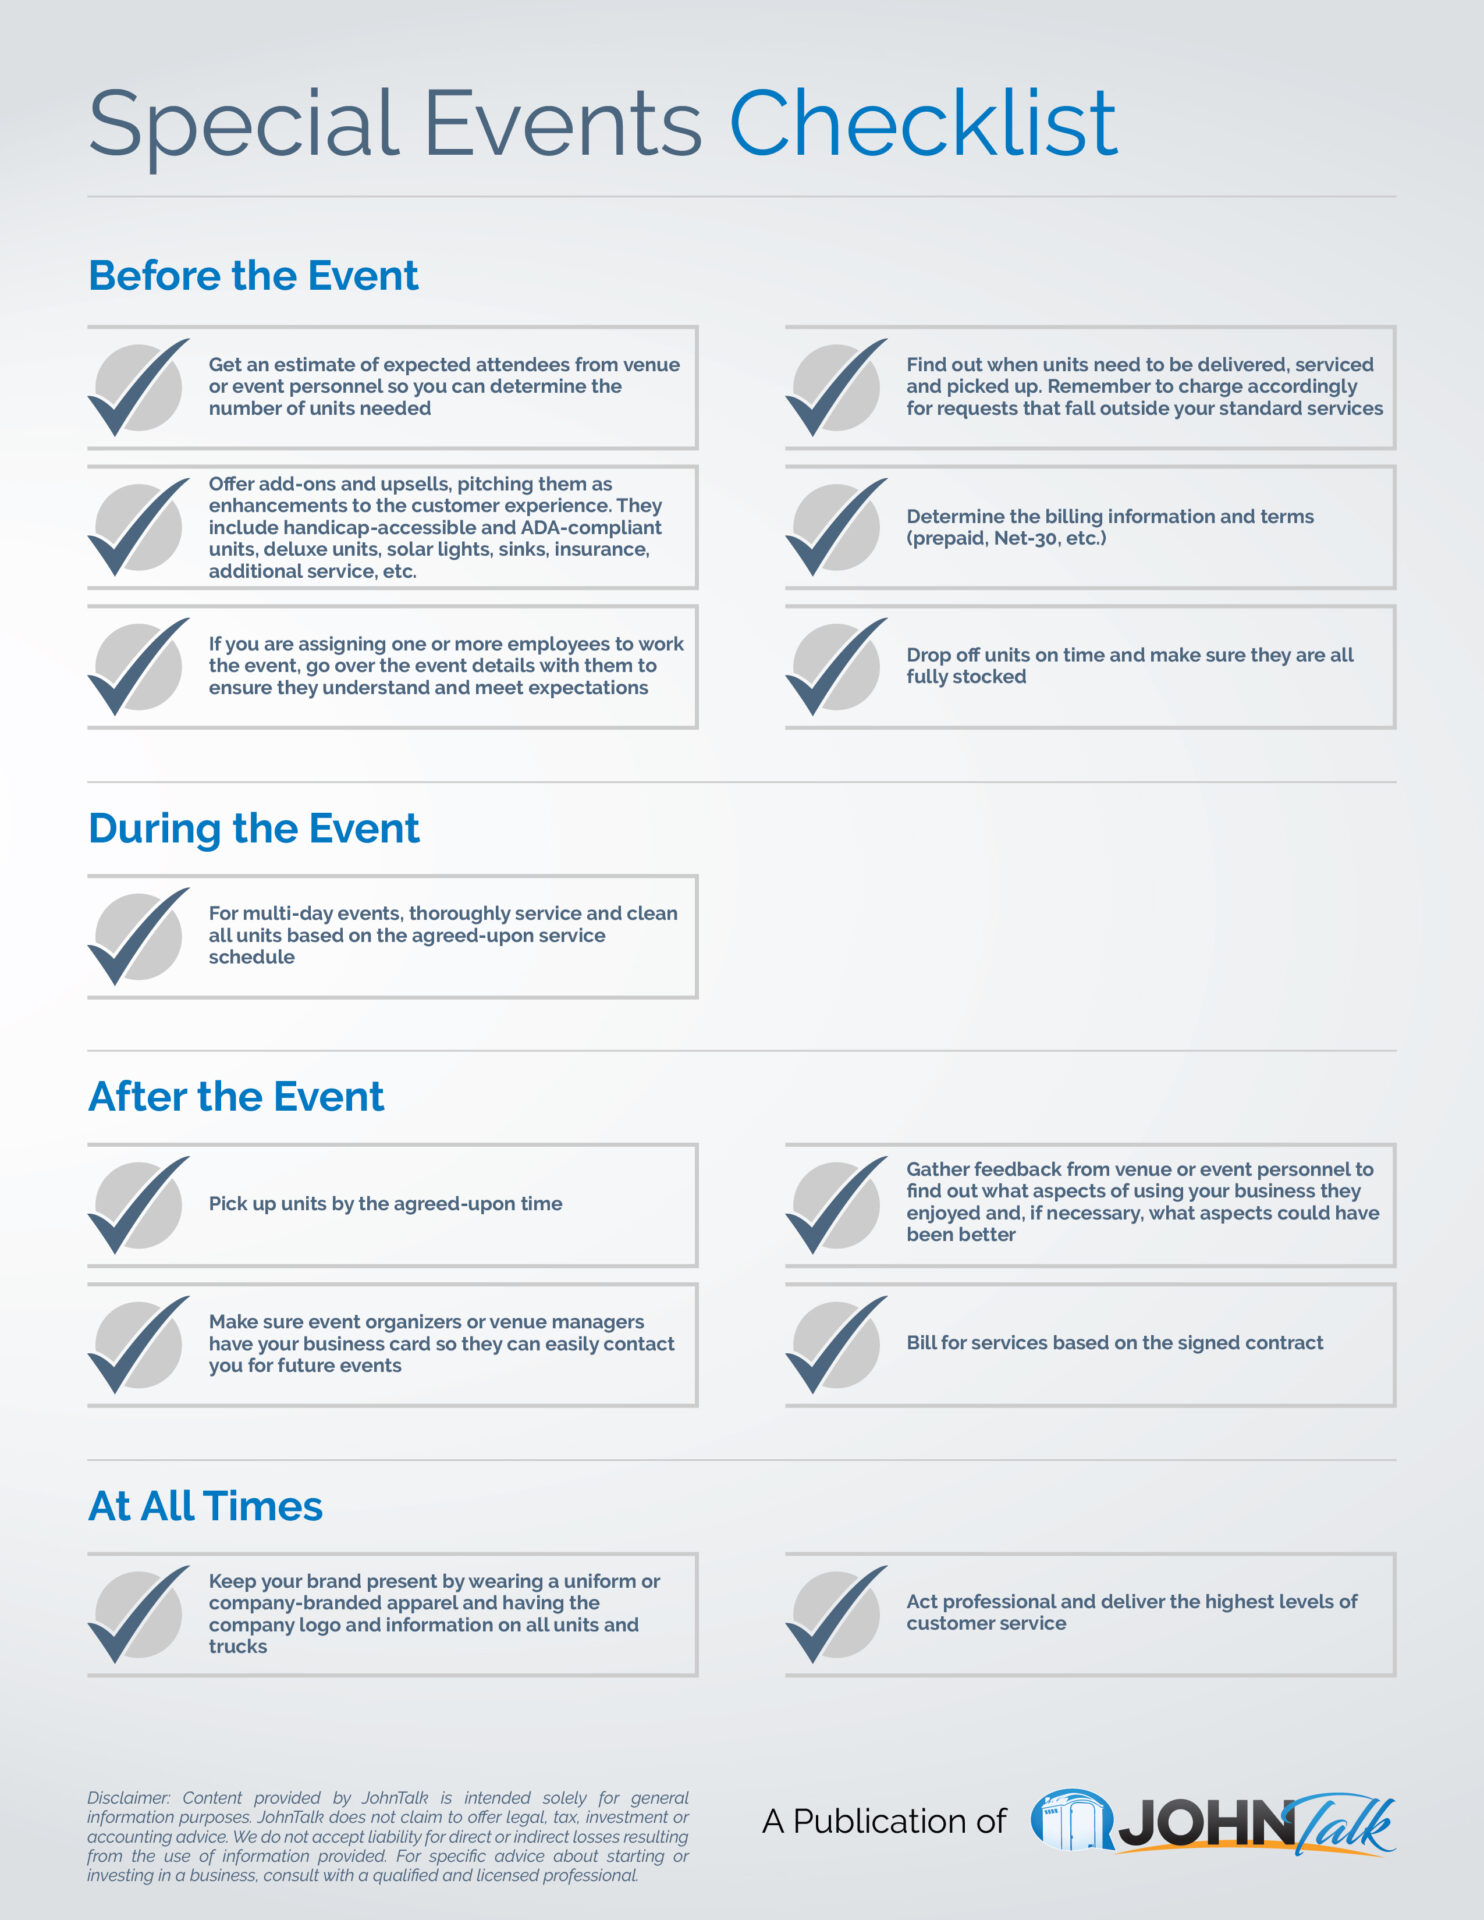 SpecialEvents_Checklist